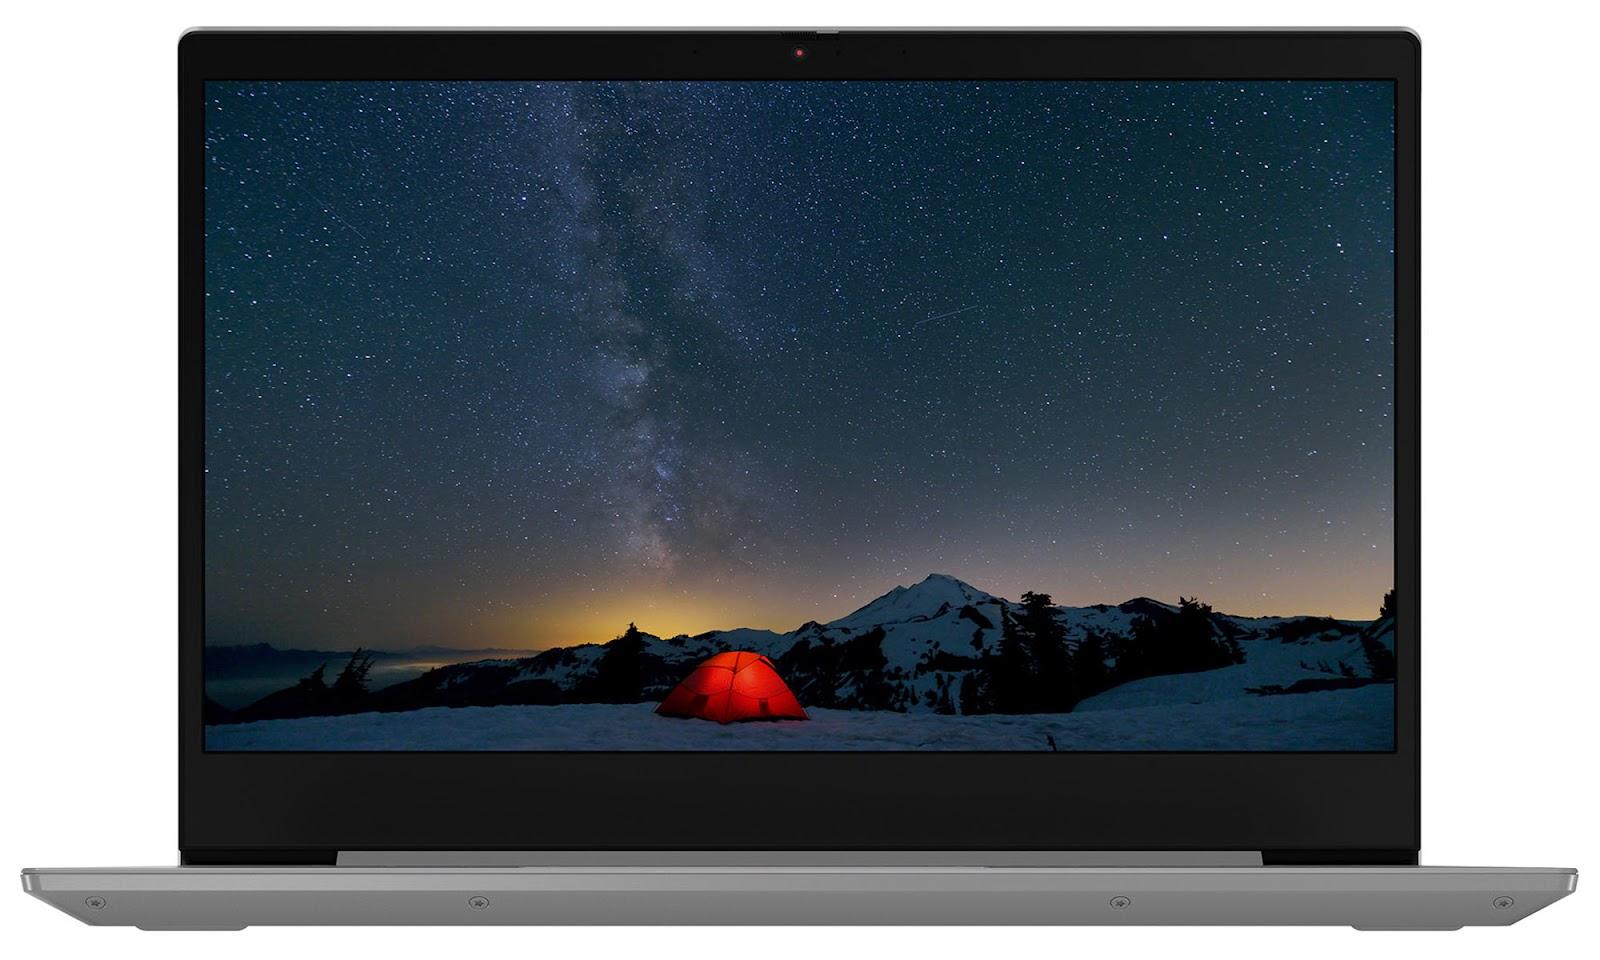 Фото 1. Ноутбук Lenovo ThinkBook 14 IIL (20SL002VRU)